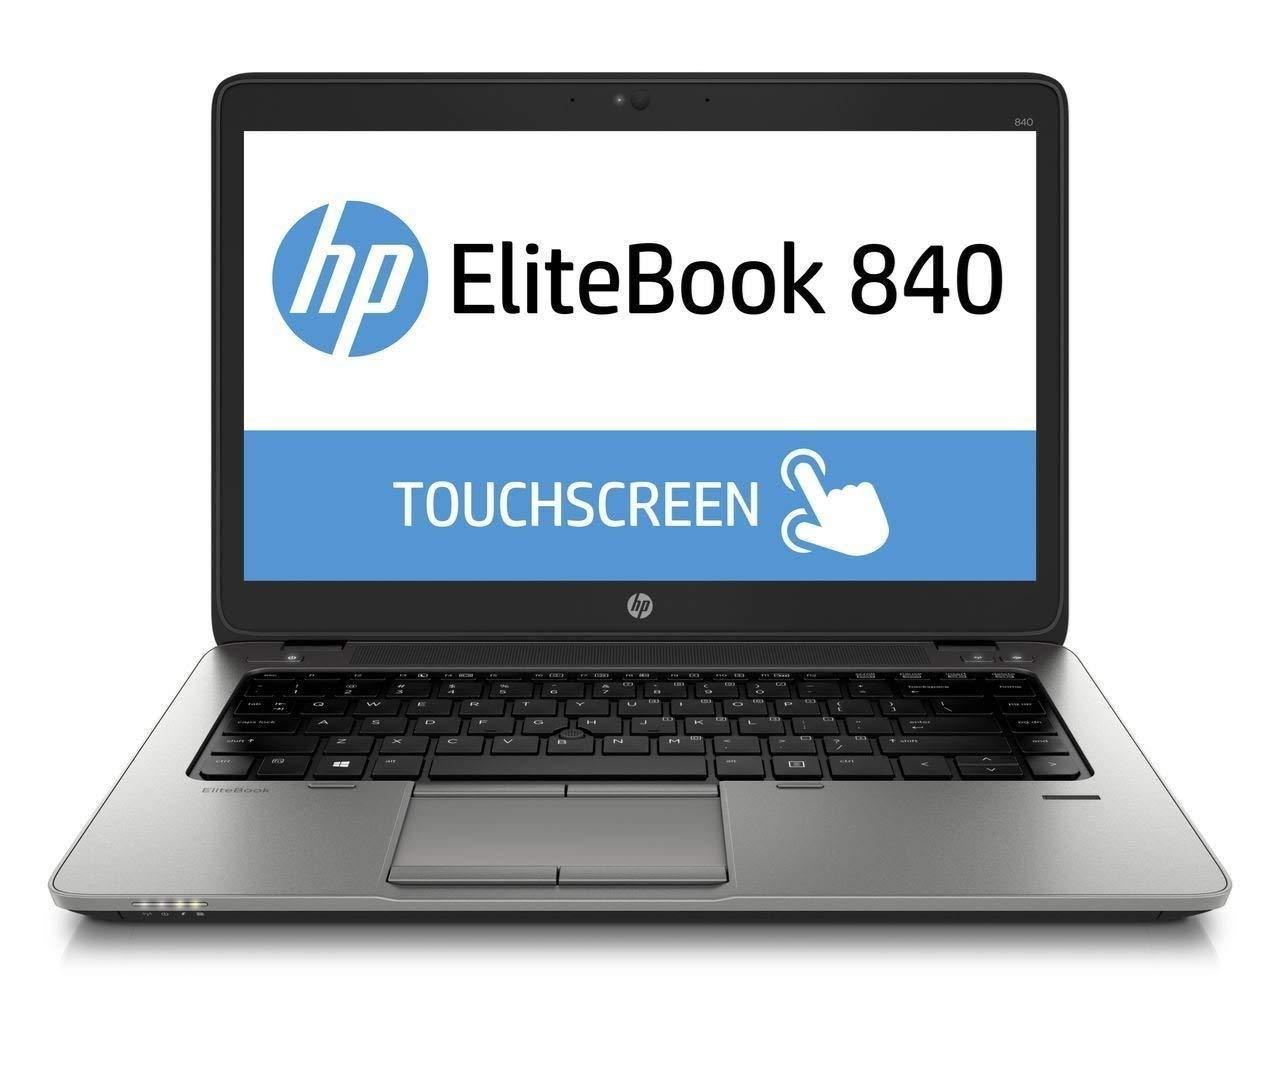 "HP ELITEBOOK 840 G2, 14"", INTEL CORE I7-5600U @2.6GHZ, 8GB RAM, 500GB HDD, INTEL HD GRAPHICS 5500, WINDOWS 8.1 PRO Laptop (Certified Refurbished)"